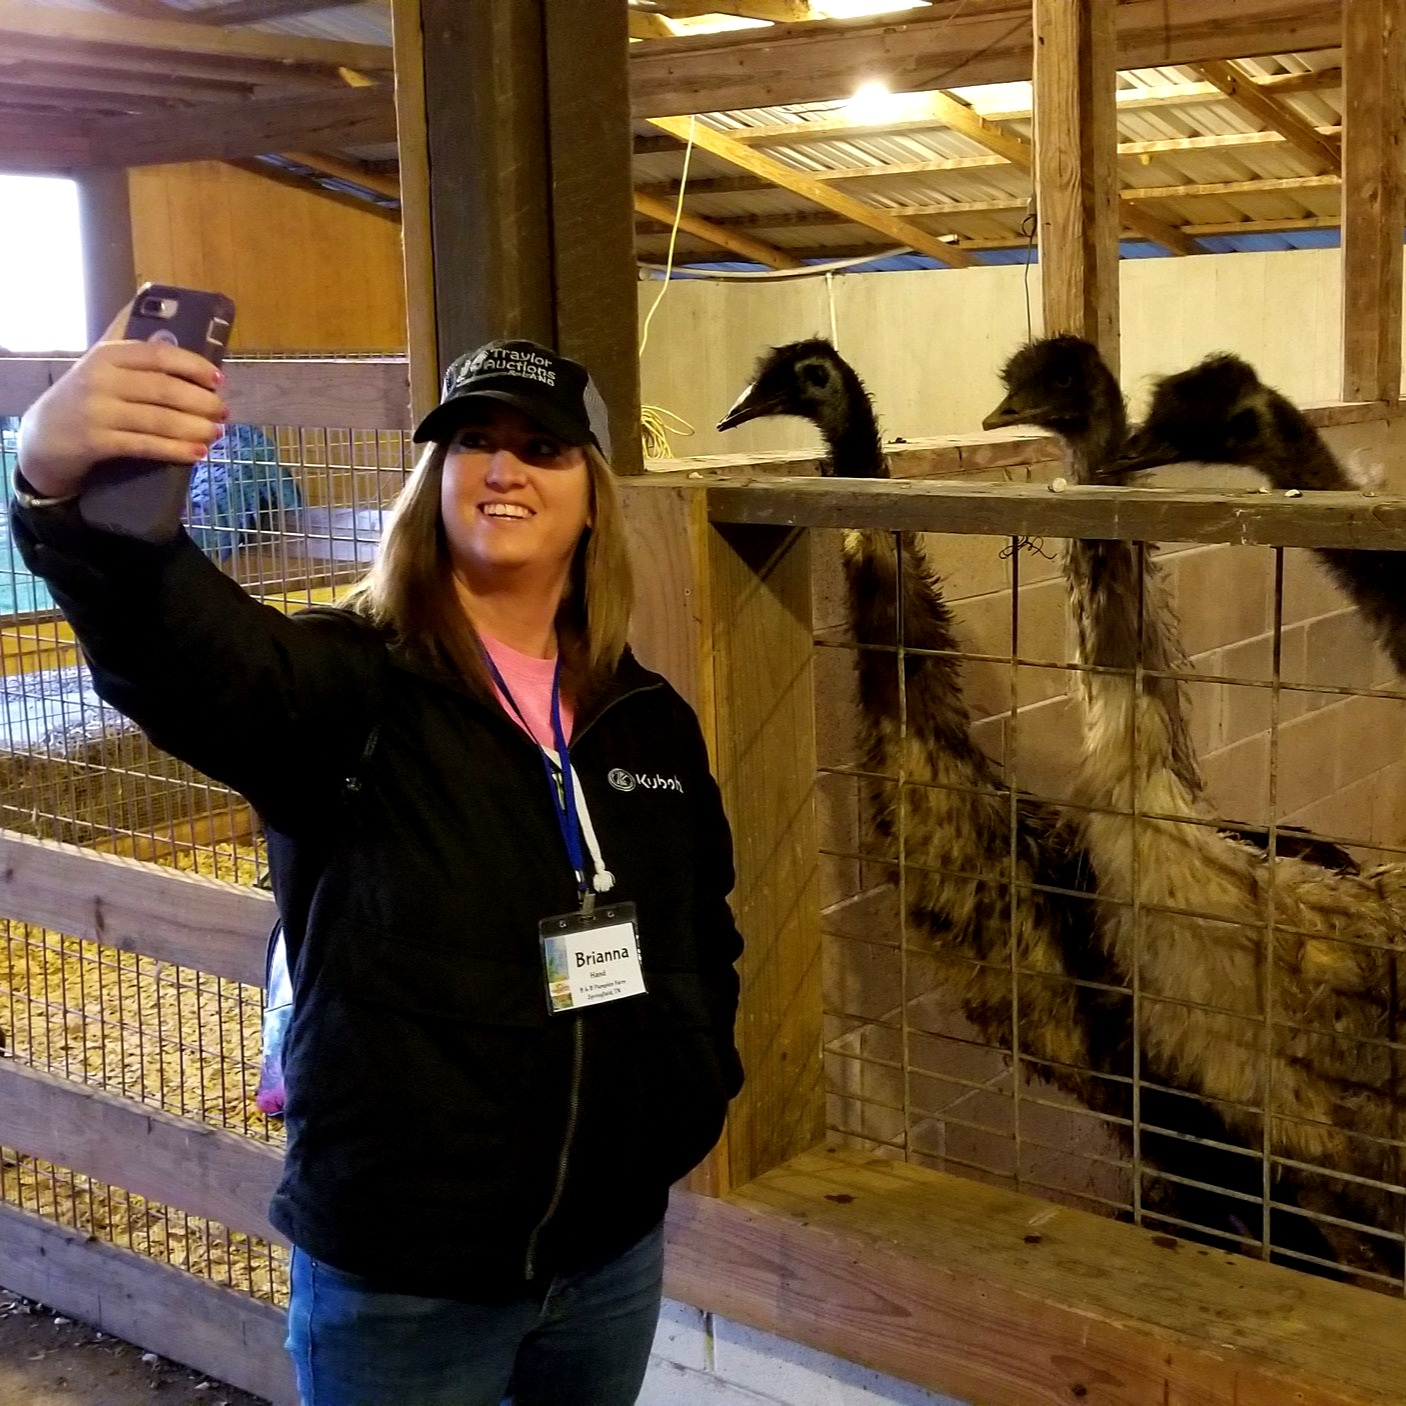 #emuselfie at Rutland Farms in Tifton, Georgia